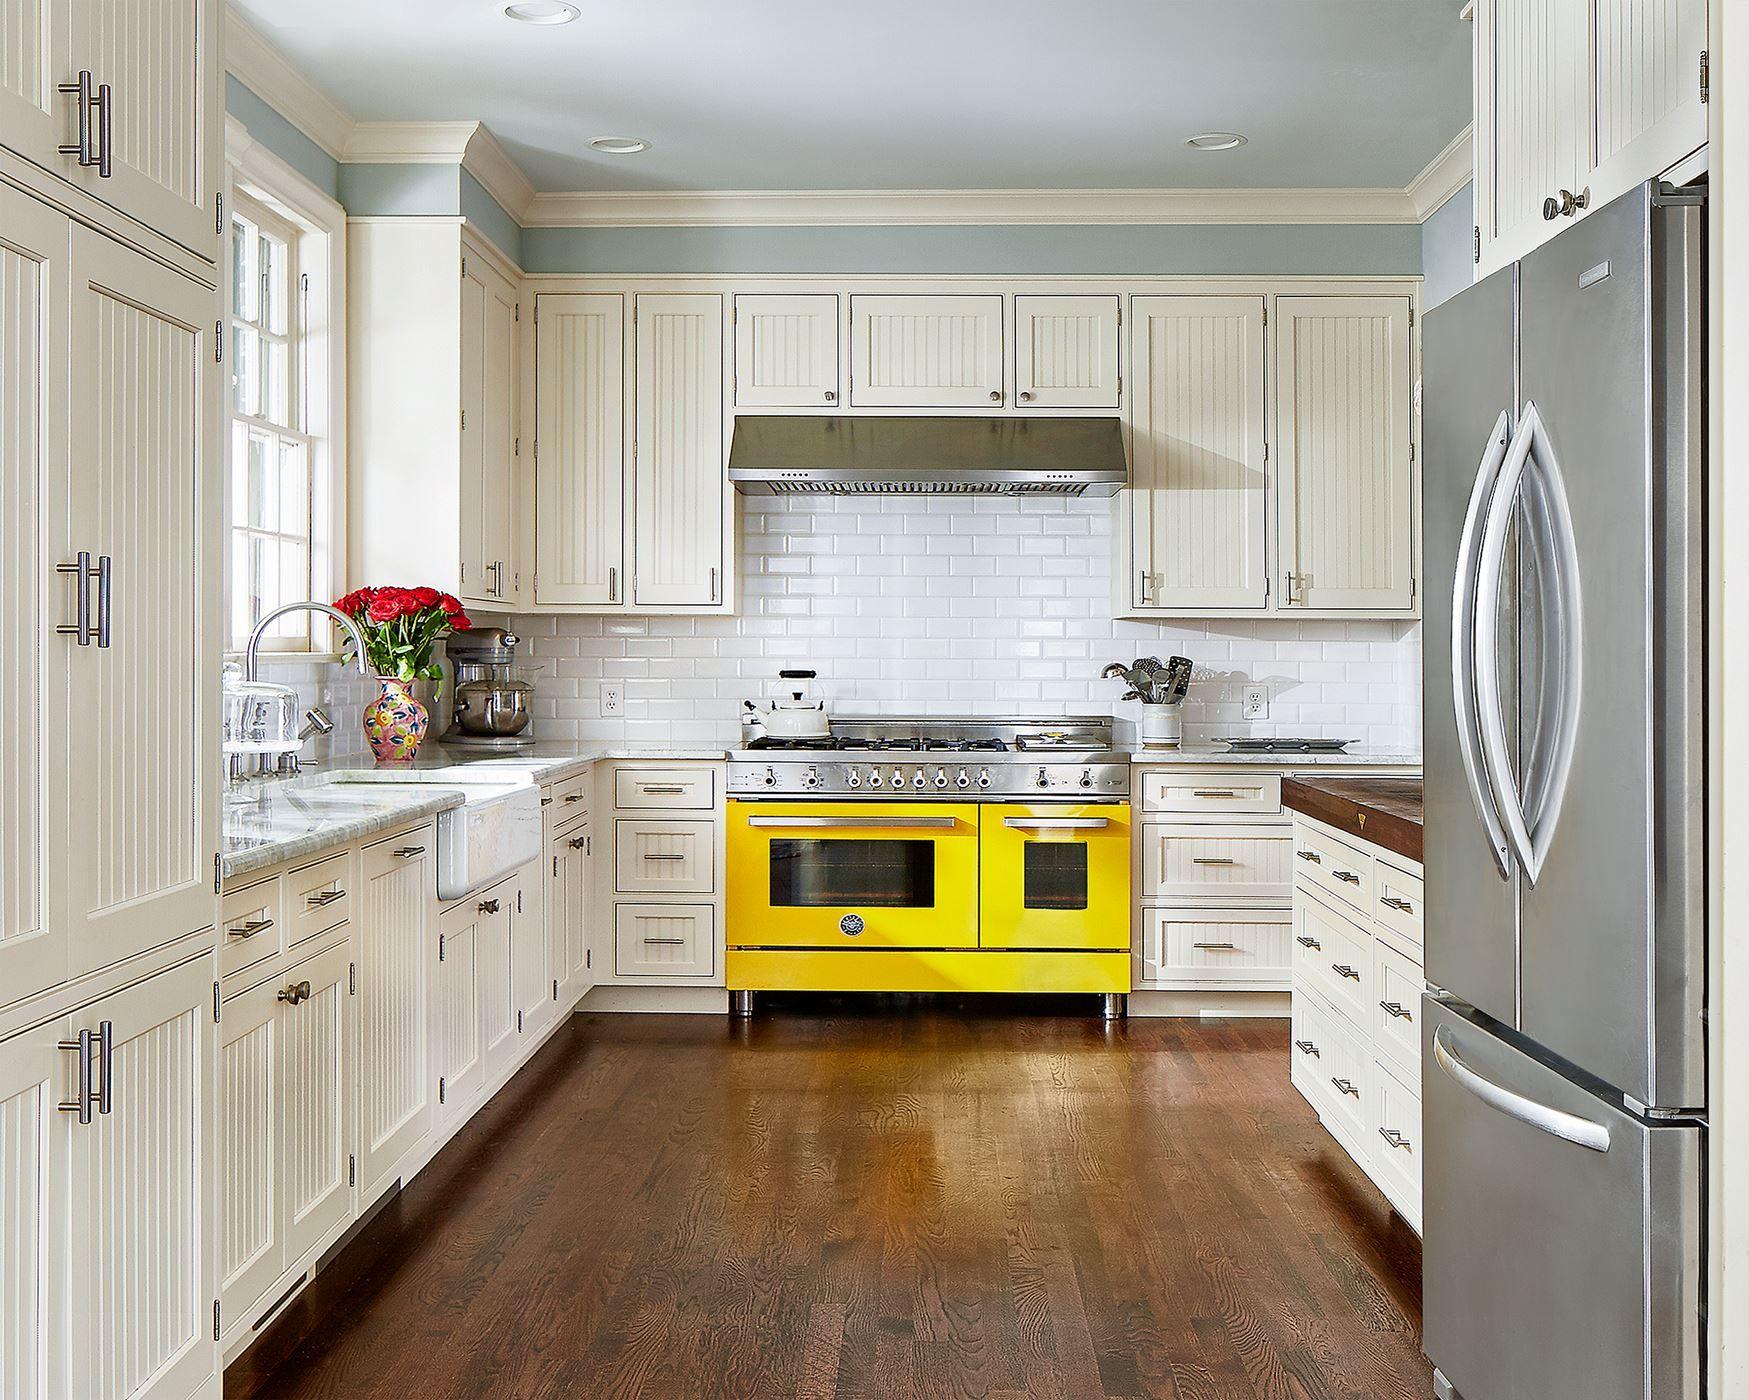 Sunshine Kitchen Cabinet Inspiration Just Cabinets Kitchen Remodel